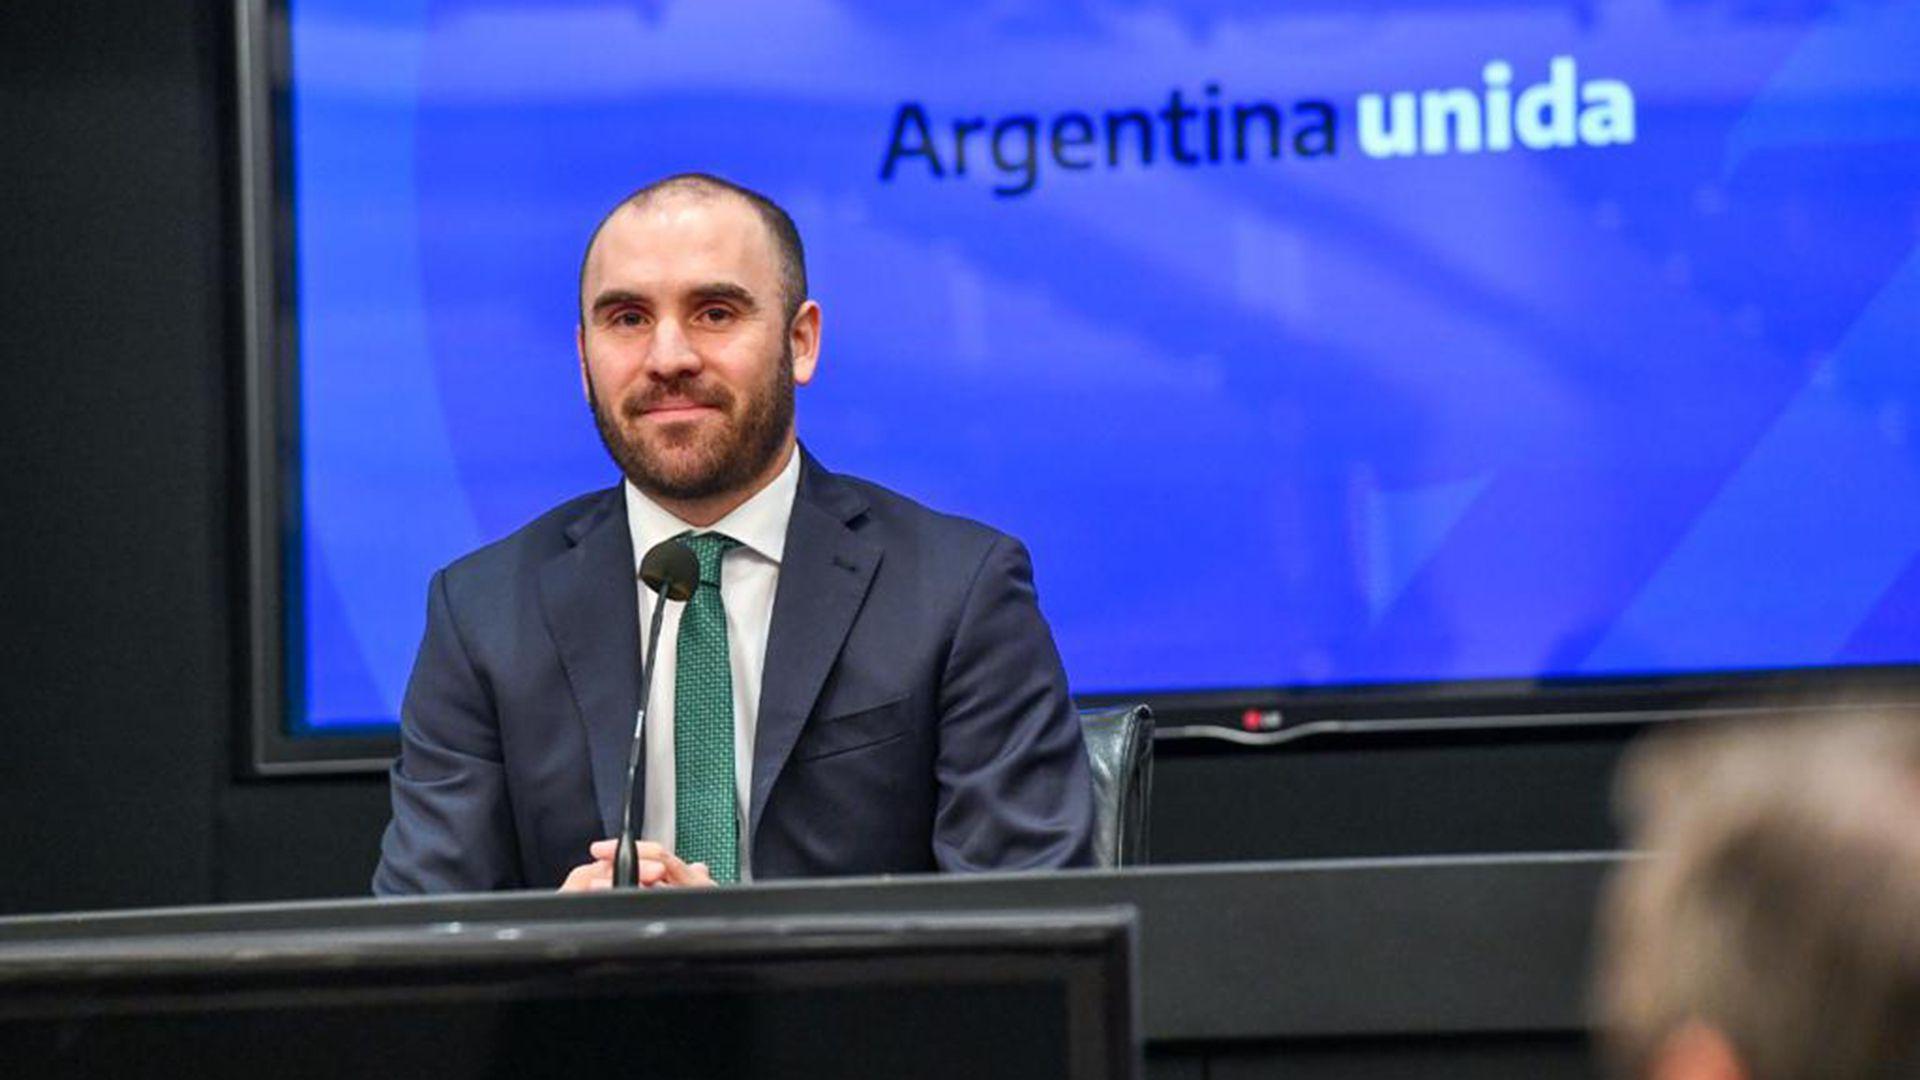 Martín Guzmán conferencia de prensa ministerio de Economía